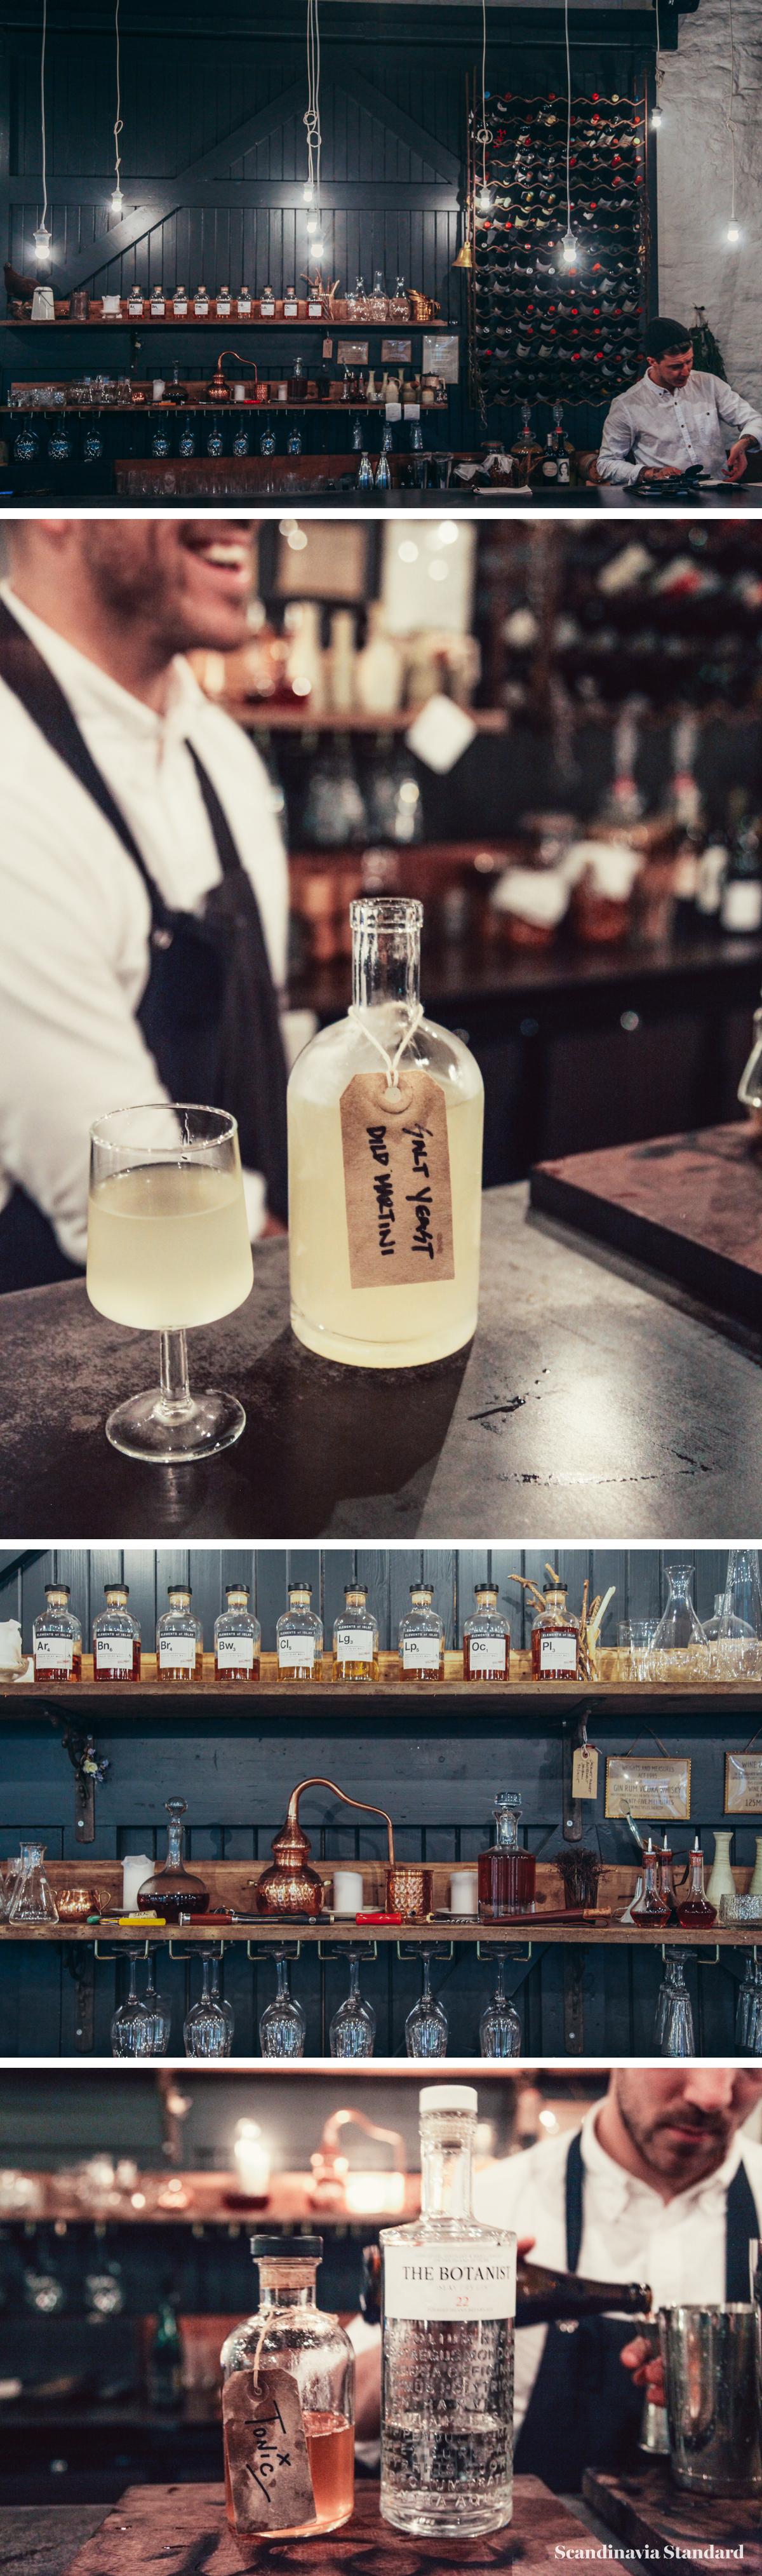 Timberyard-Edinburgh-Cocktails-Scandinavia-Standard